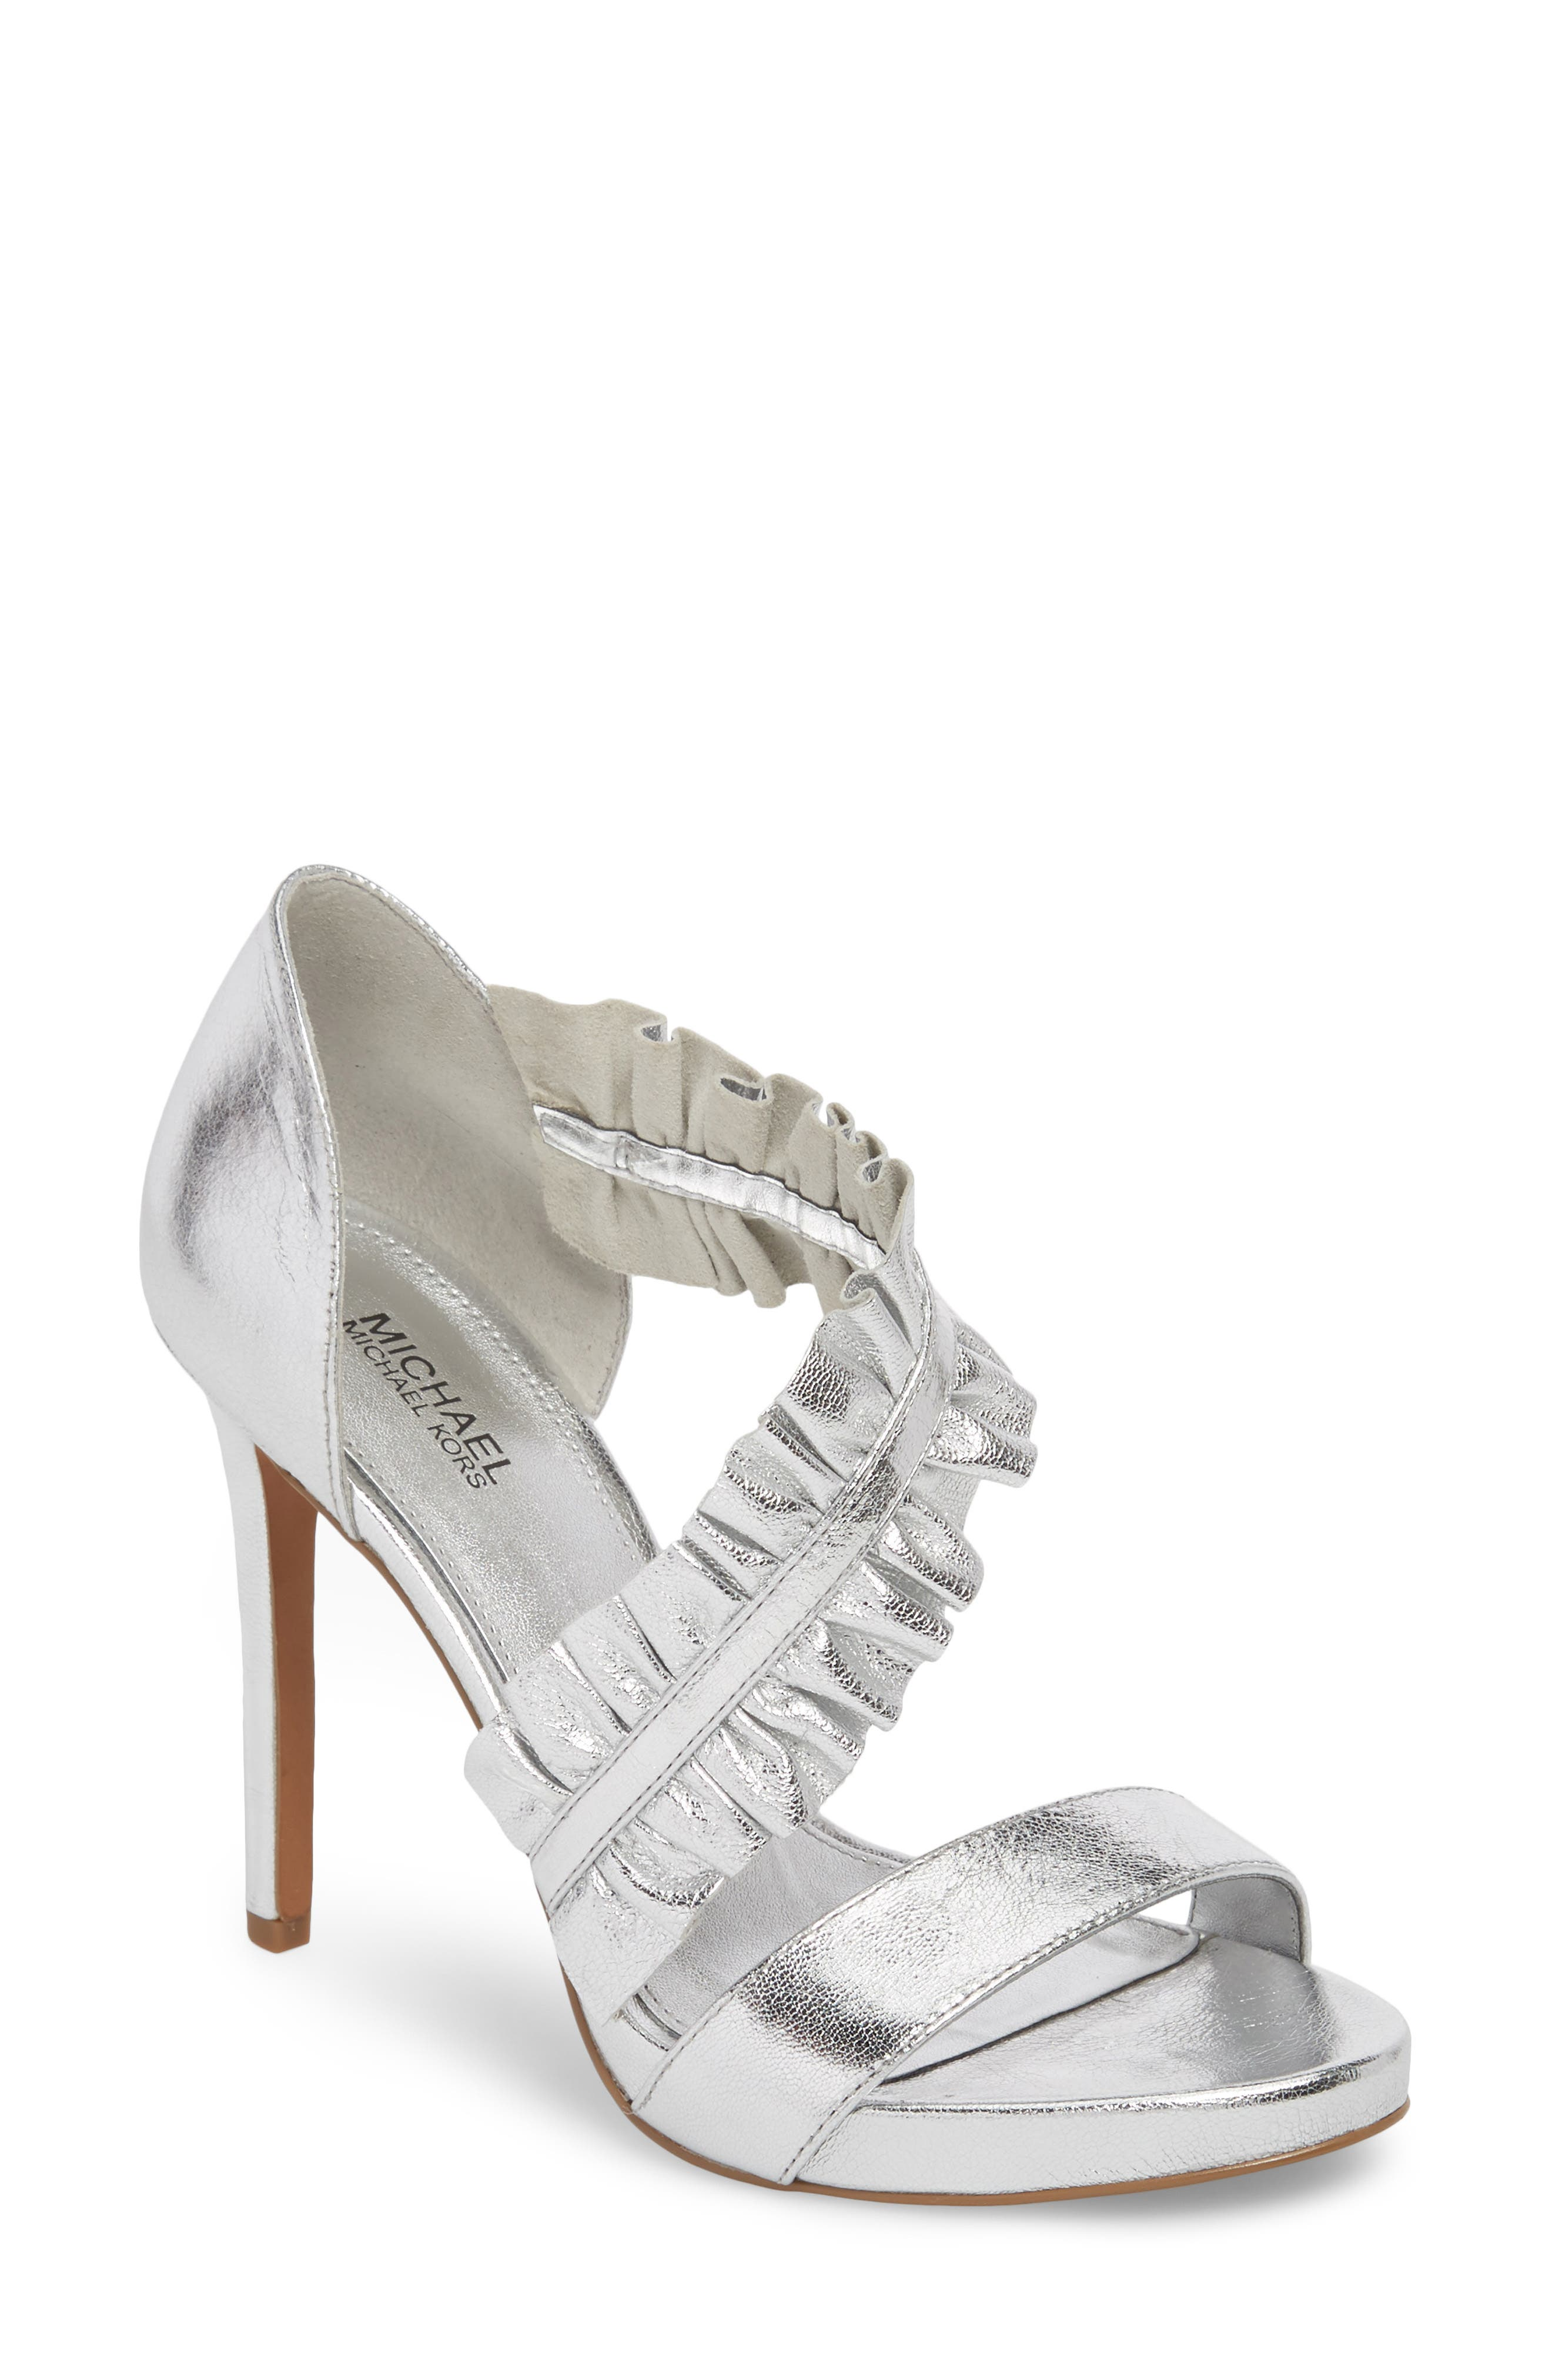 Bella Ruffle Sandal,                             Main thumbnail 1, color,                             Silver Nappa Leather